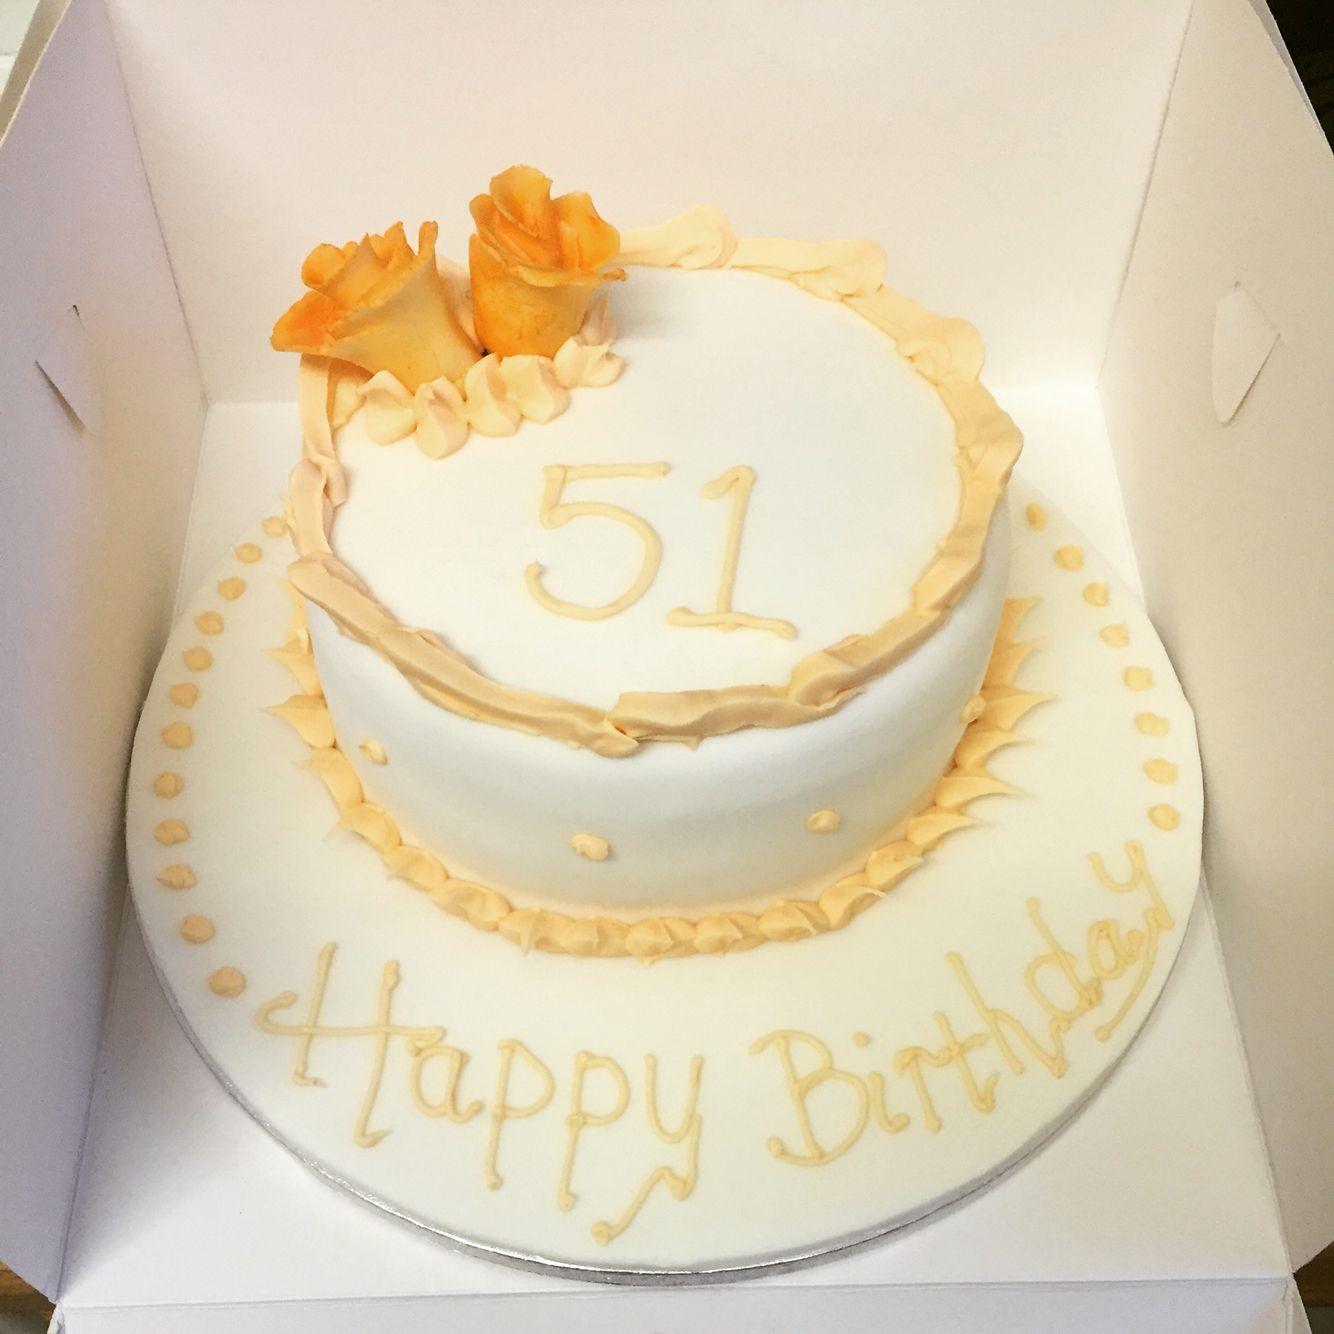 Phenomenal 51St Birthday Cake Cakes For Women Birthday Cakes For Women 51 Funny Birthday Cards Online Inifofree Goldxyz